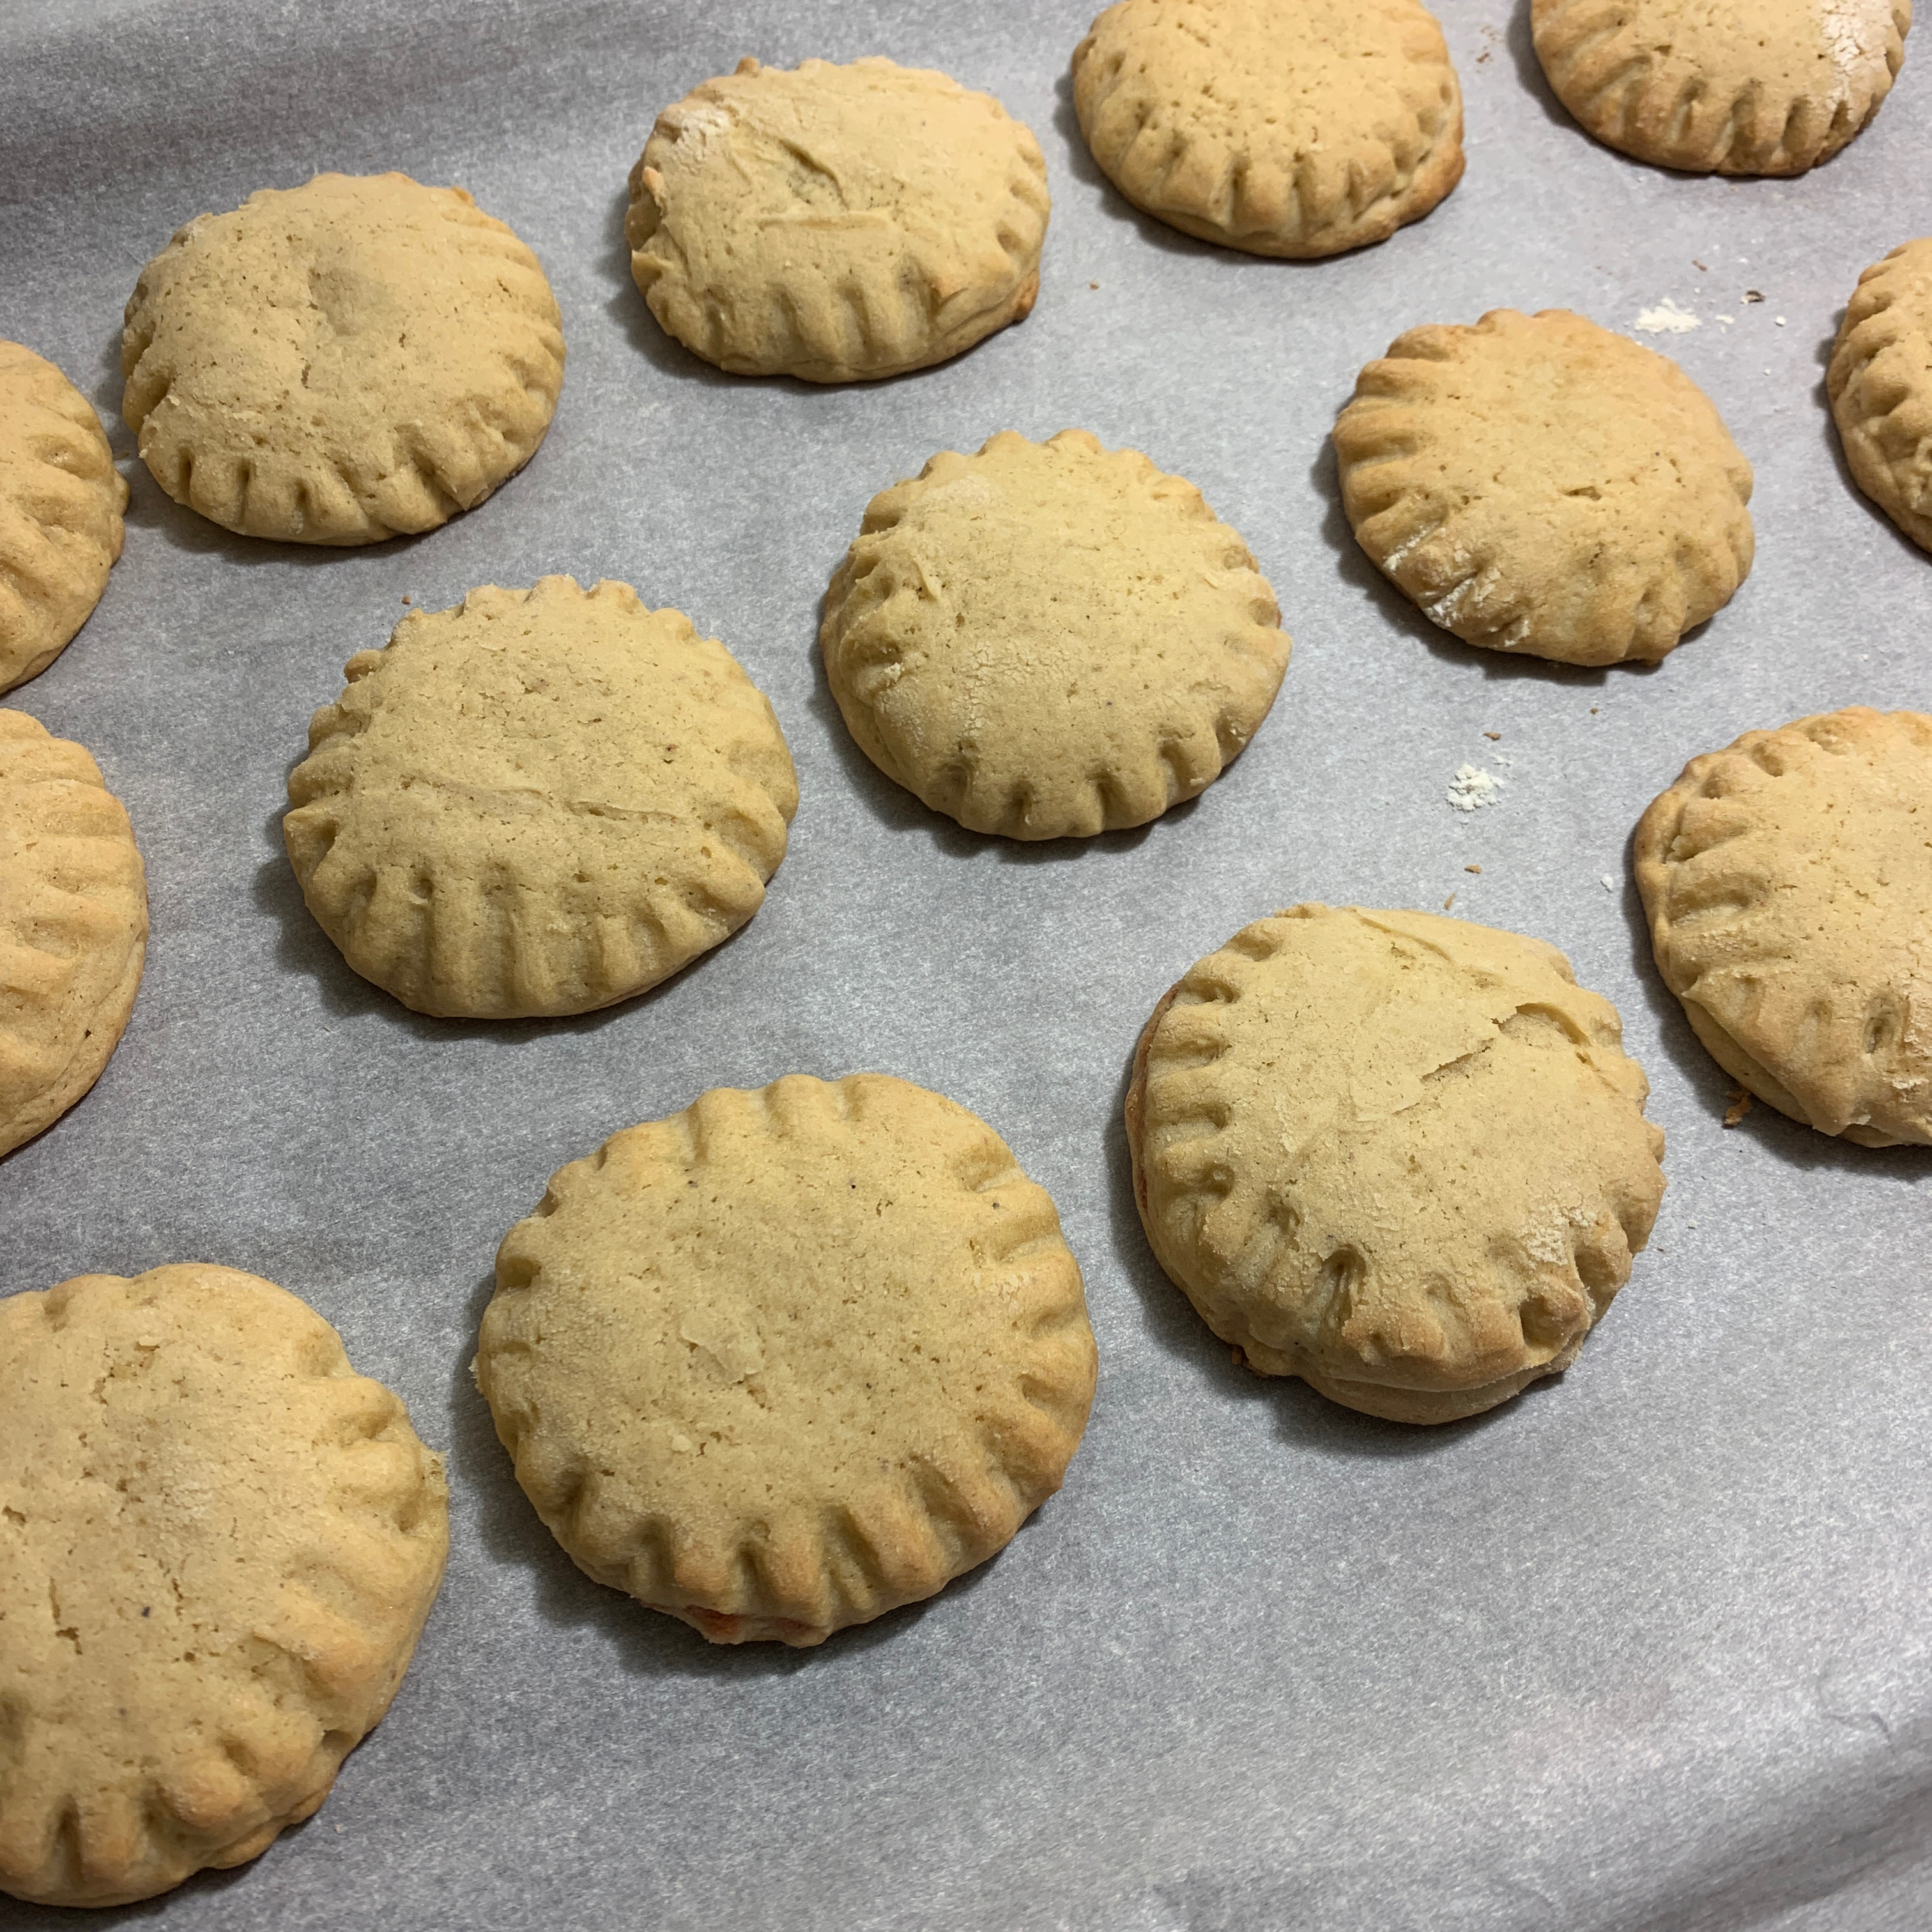 Granny's Strawberry Preserves-Filled Cookies HCapulet